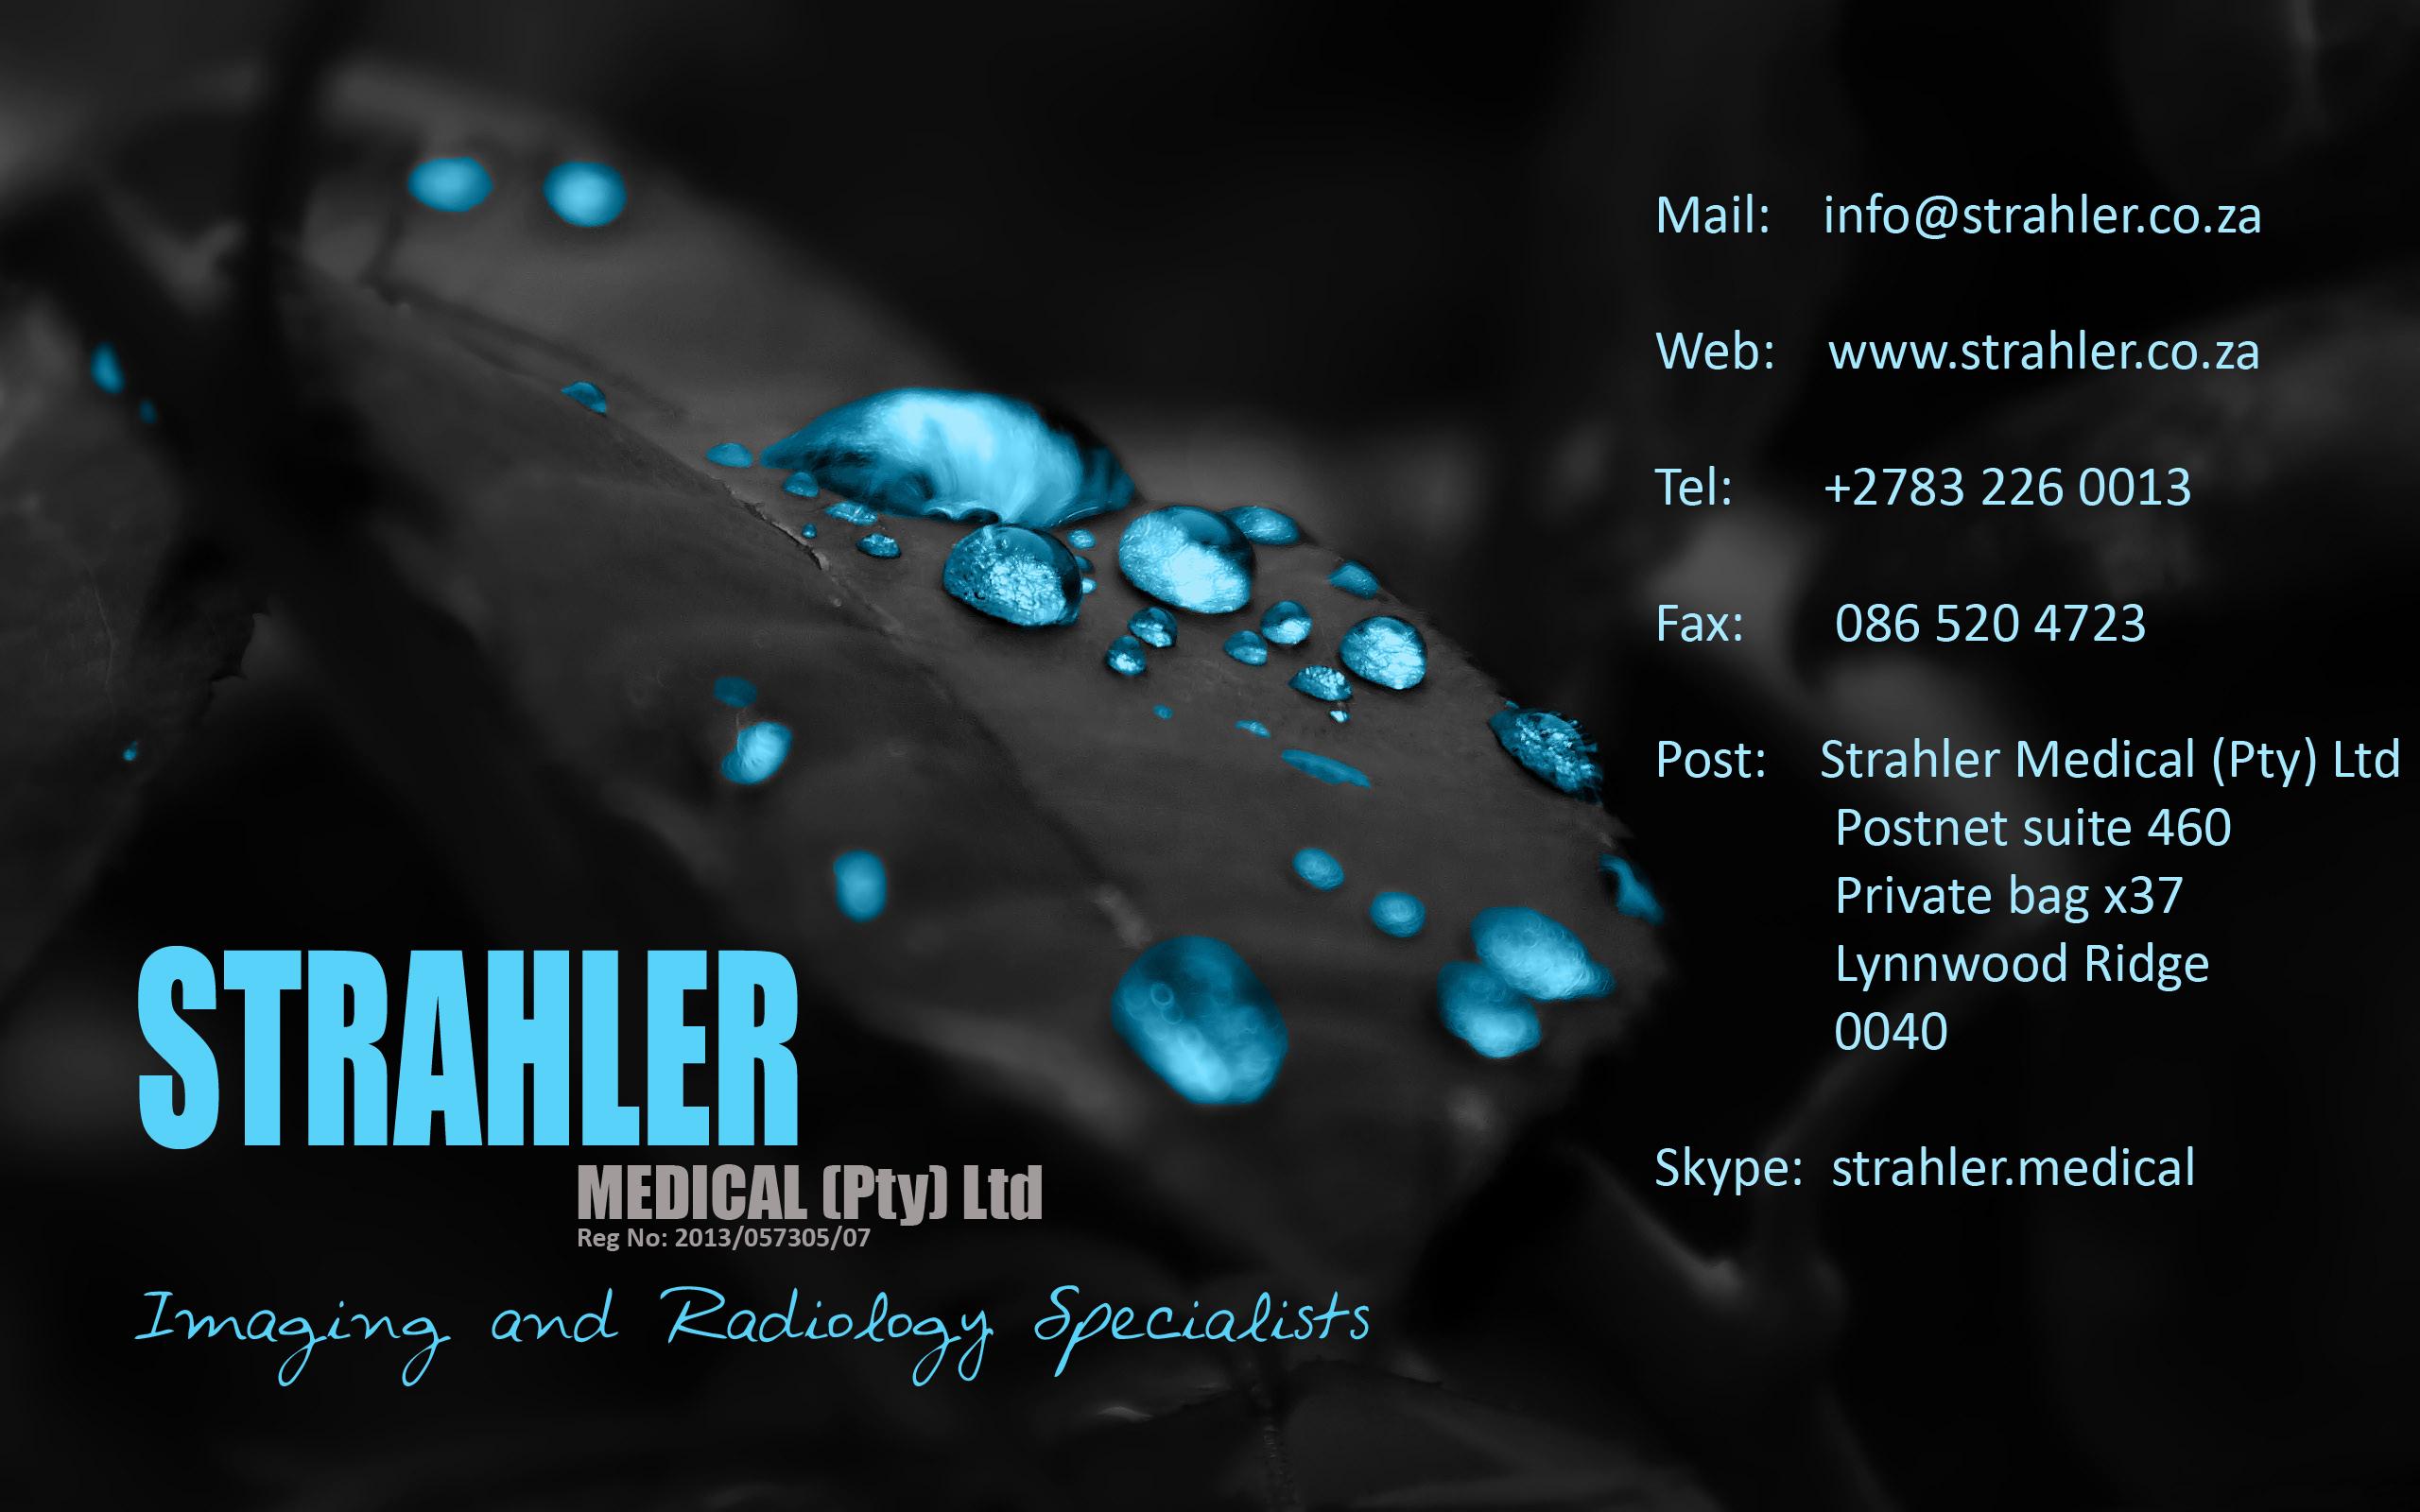 Strahler Medical Pty Ltd Wallpapers 2560x1600